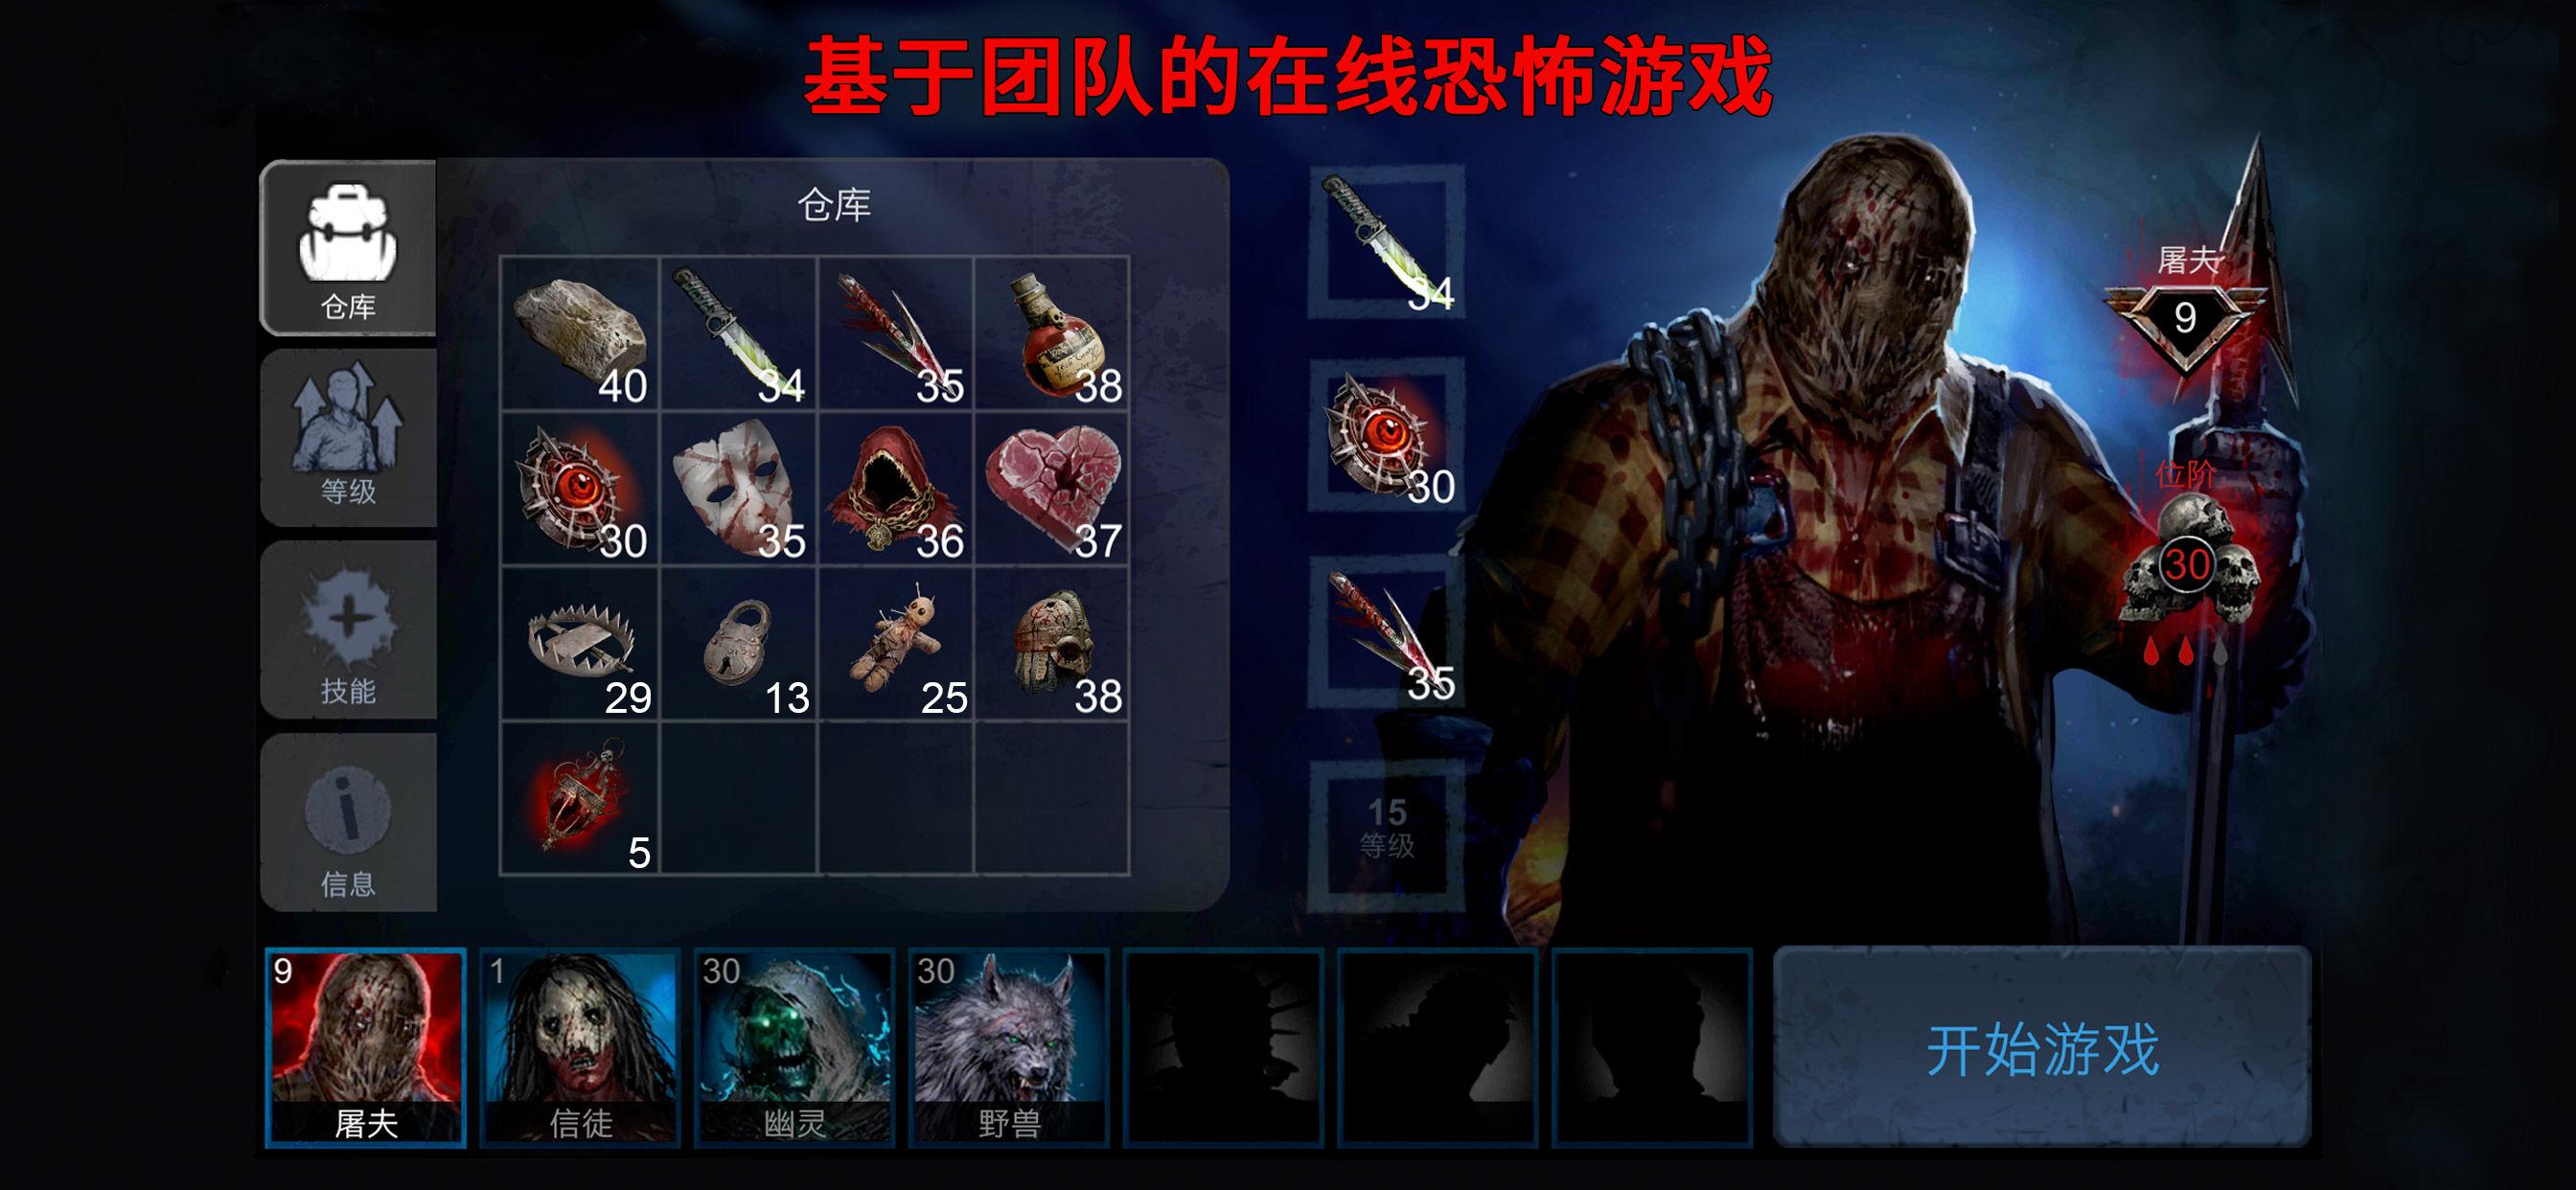 Horrorfield:多人生存恐怖游戏